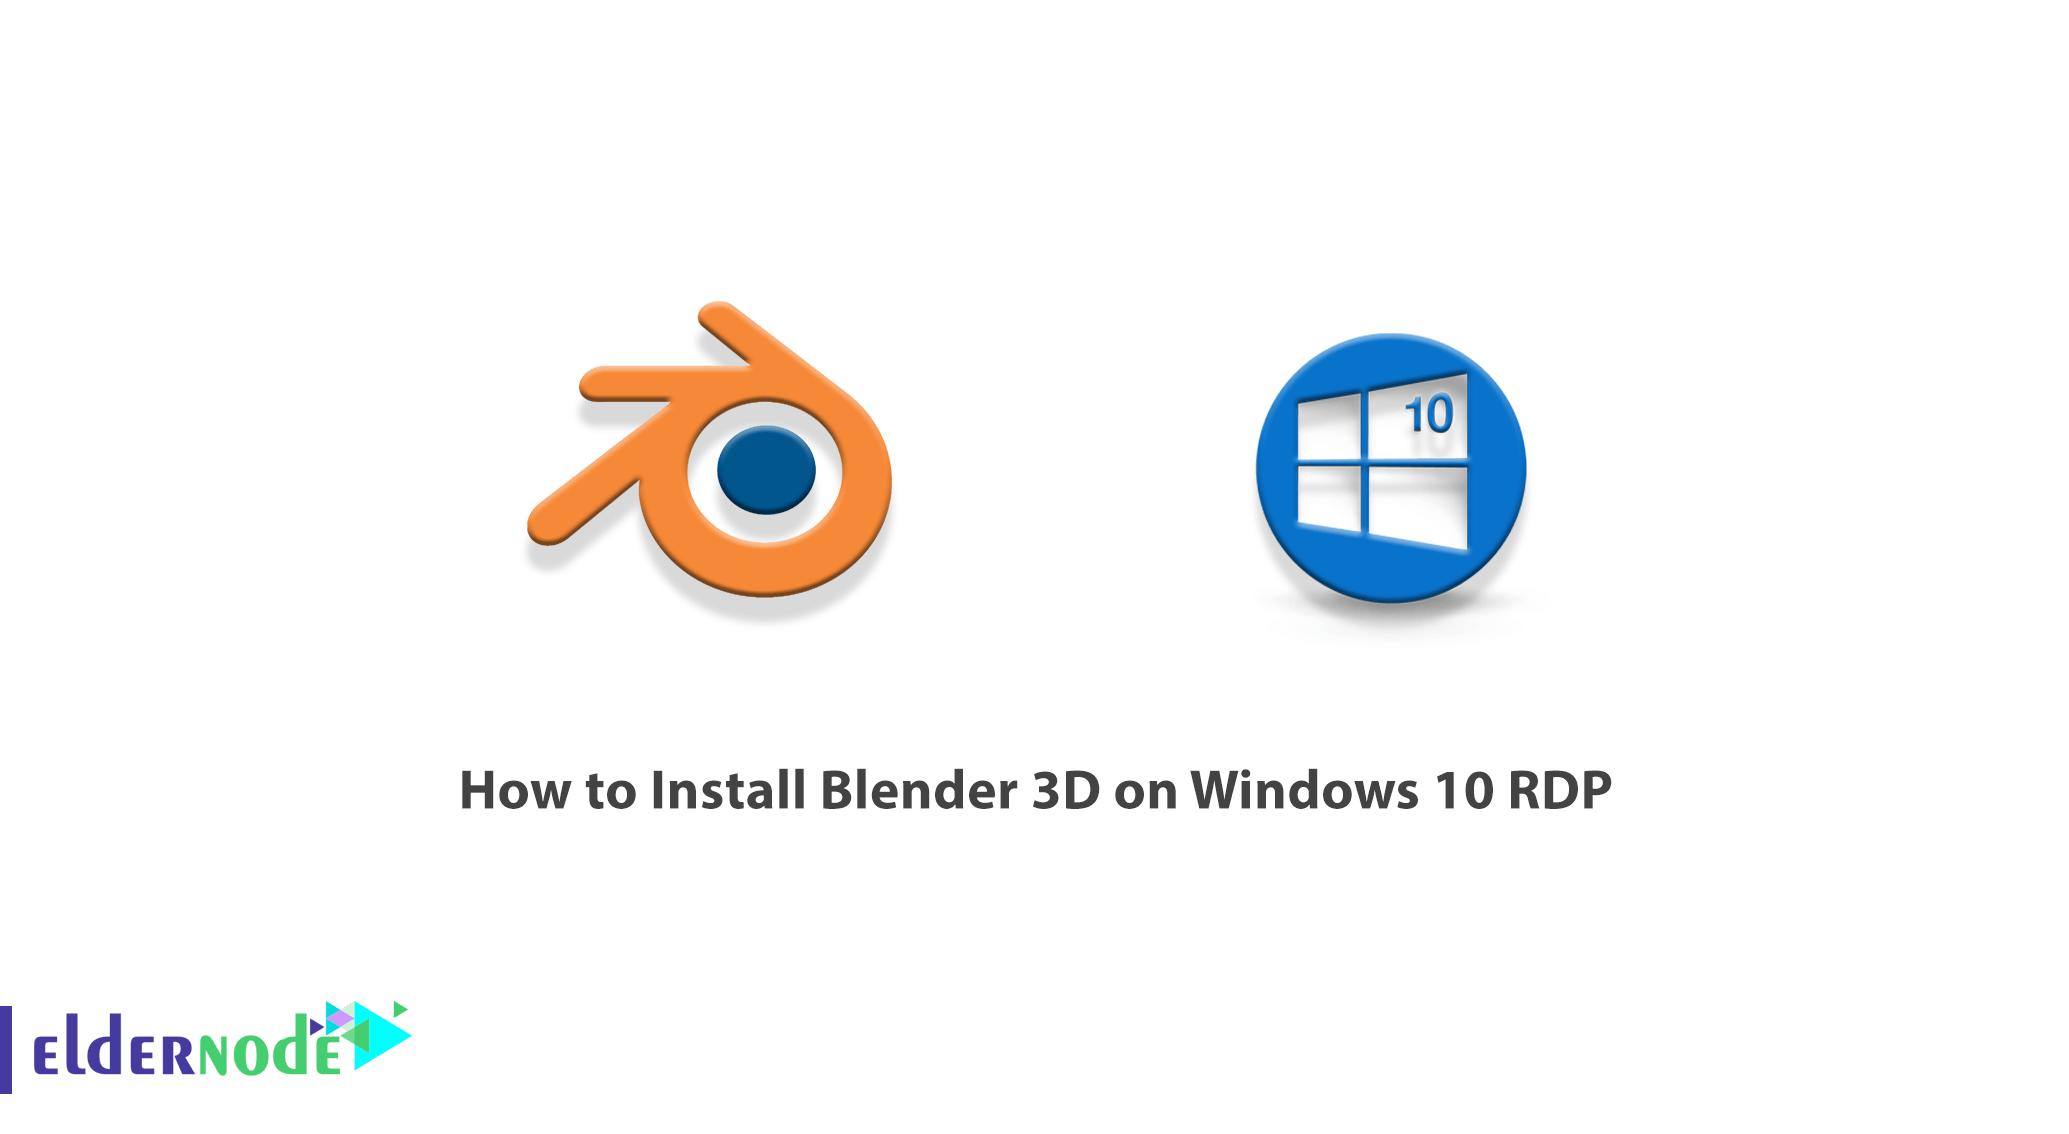 How to Install Blender 3D on Windows 10 RDP